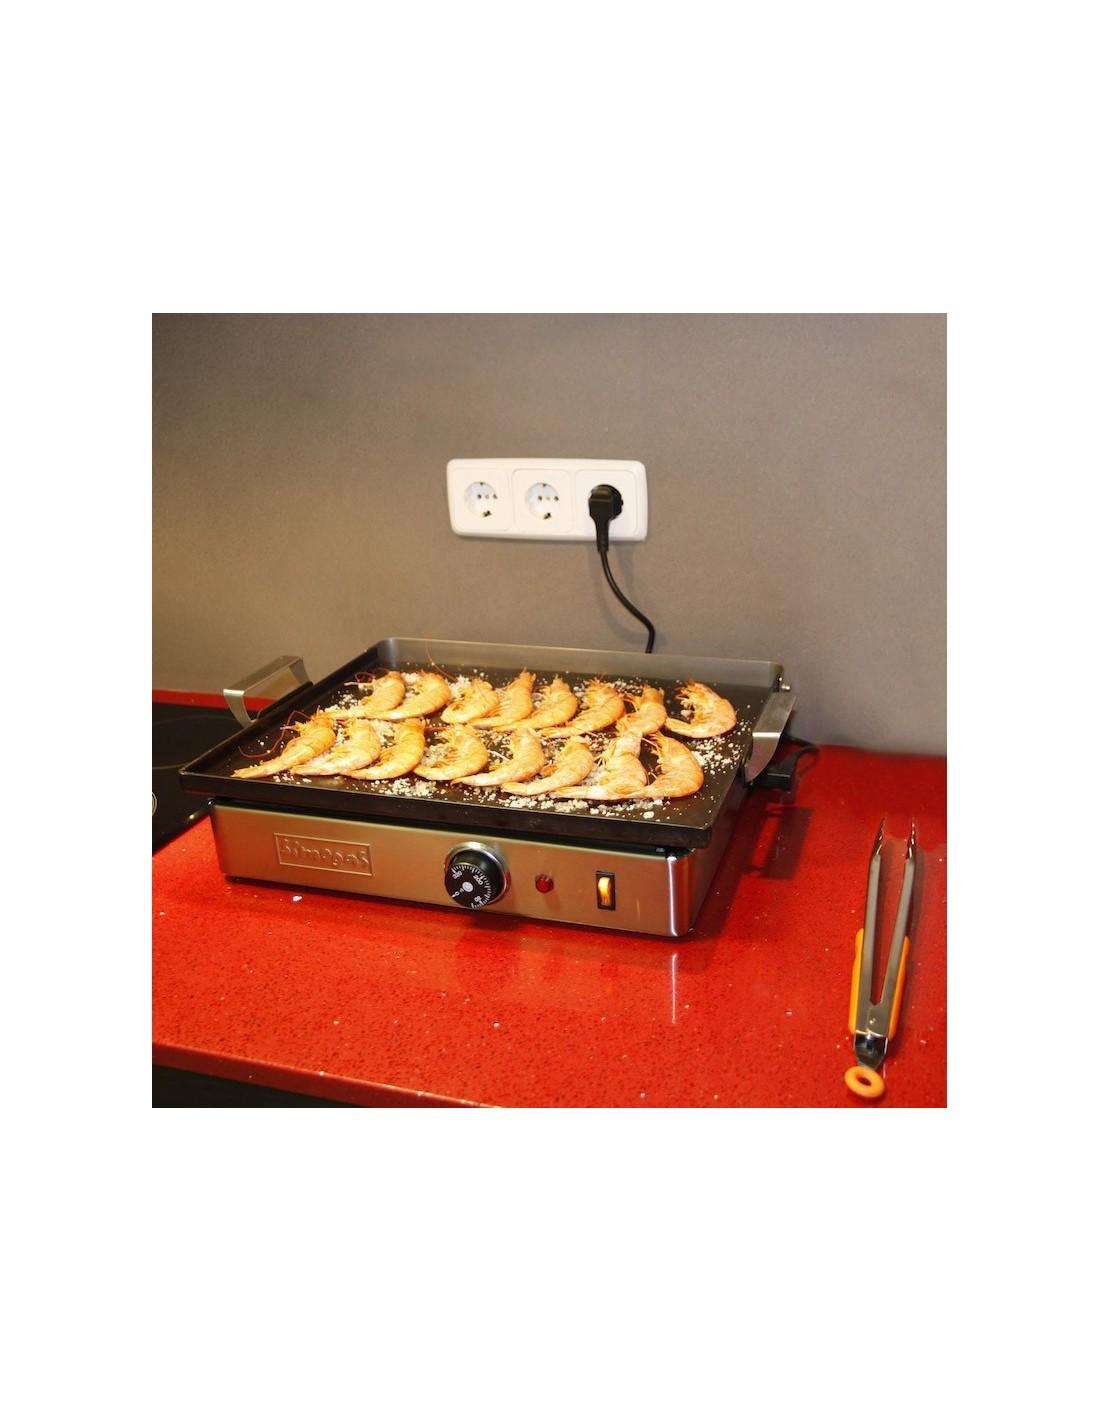 Plancha el ctrica dream dp45 acero simogas simogas - Planchas electricas cocina ...